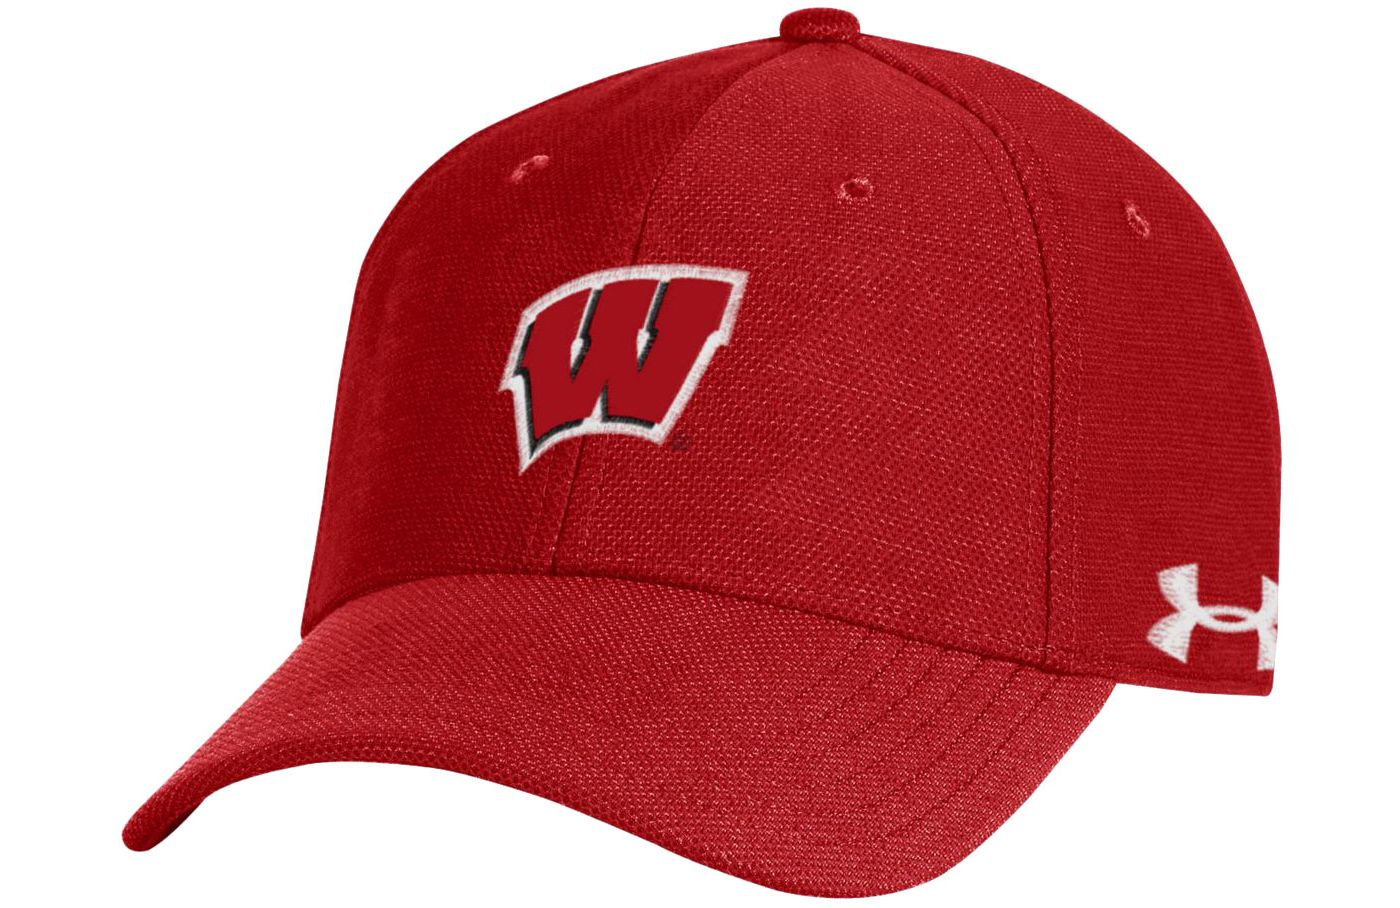 Under Armour Men's Wisconsin Badgers Red Blitzing Adjustable Hat